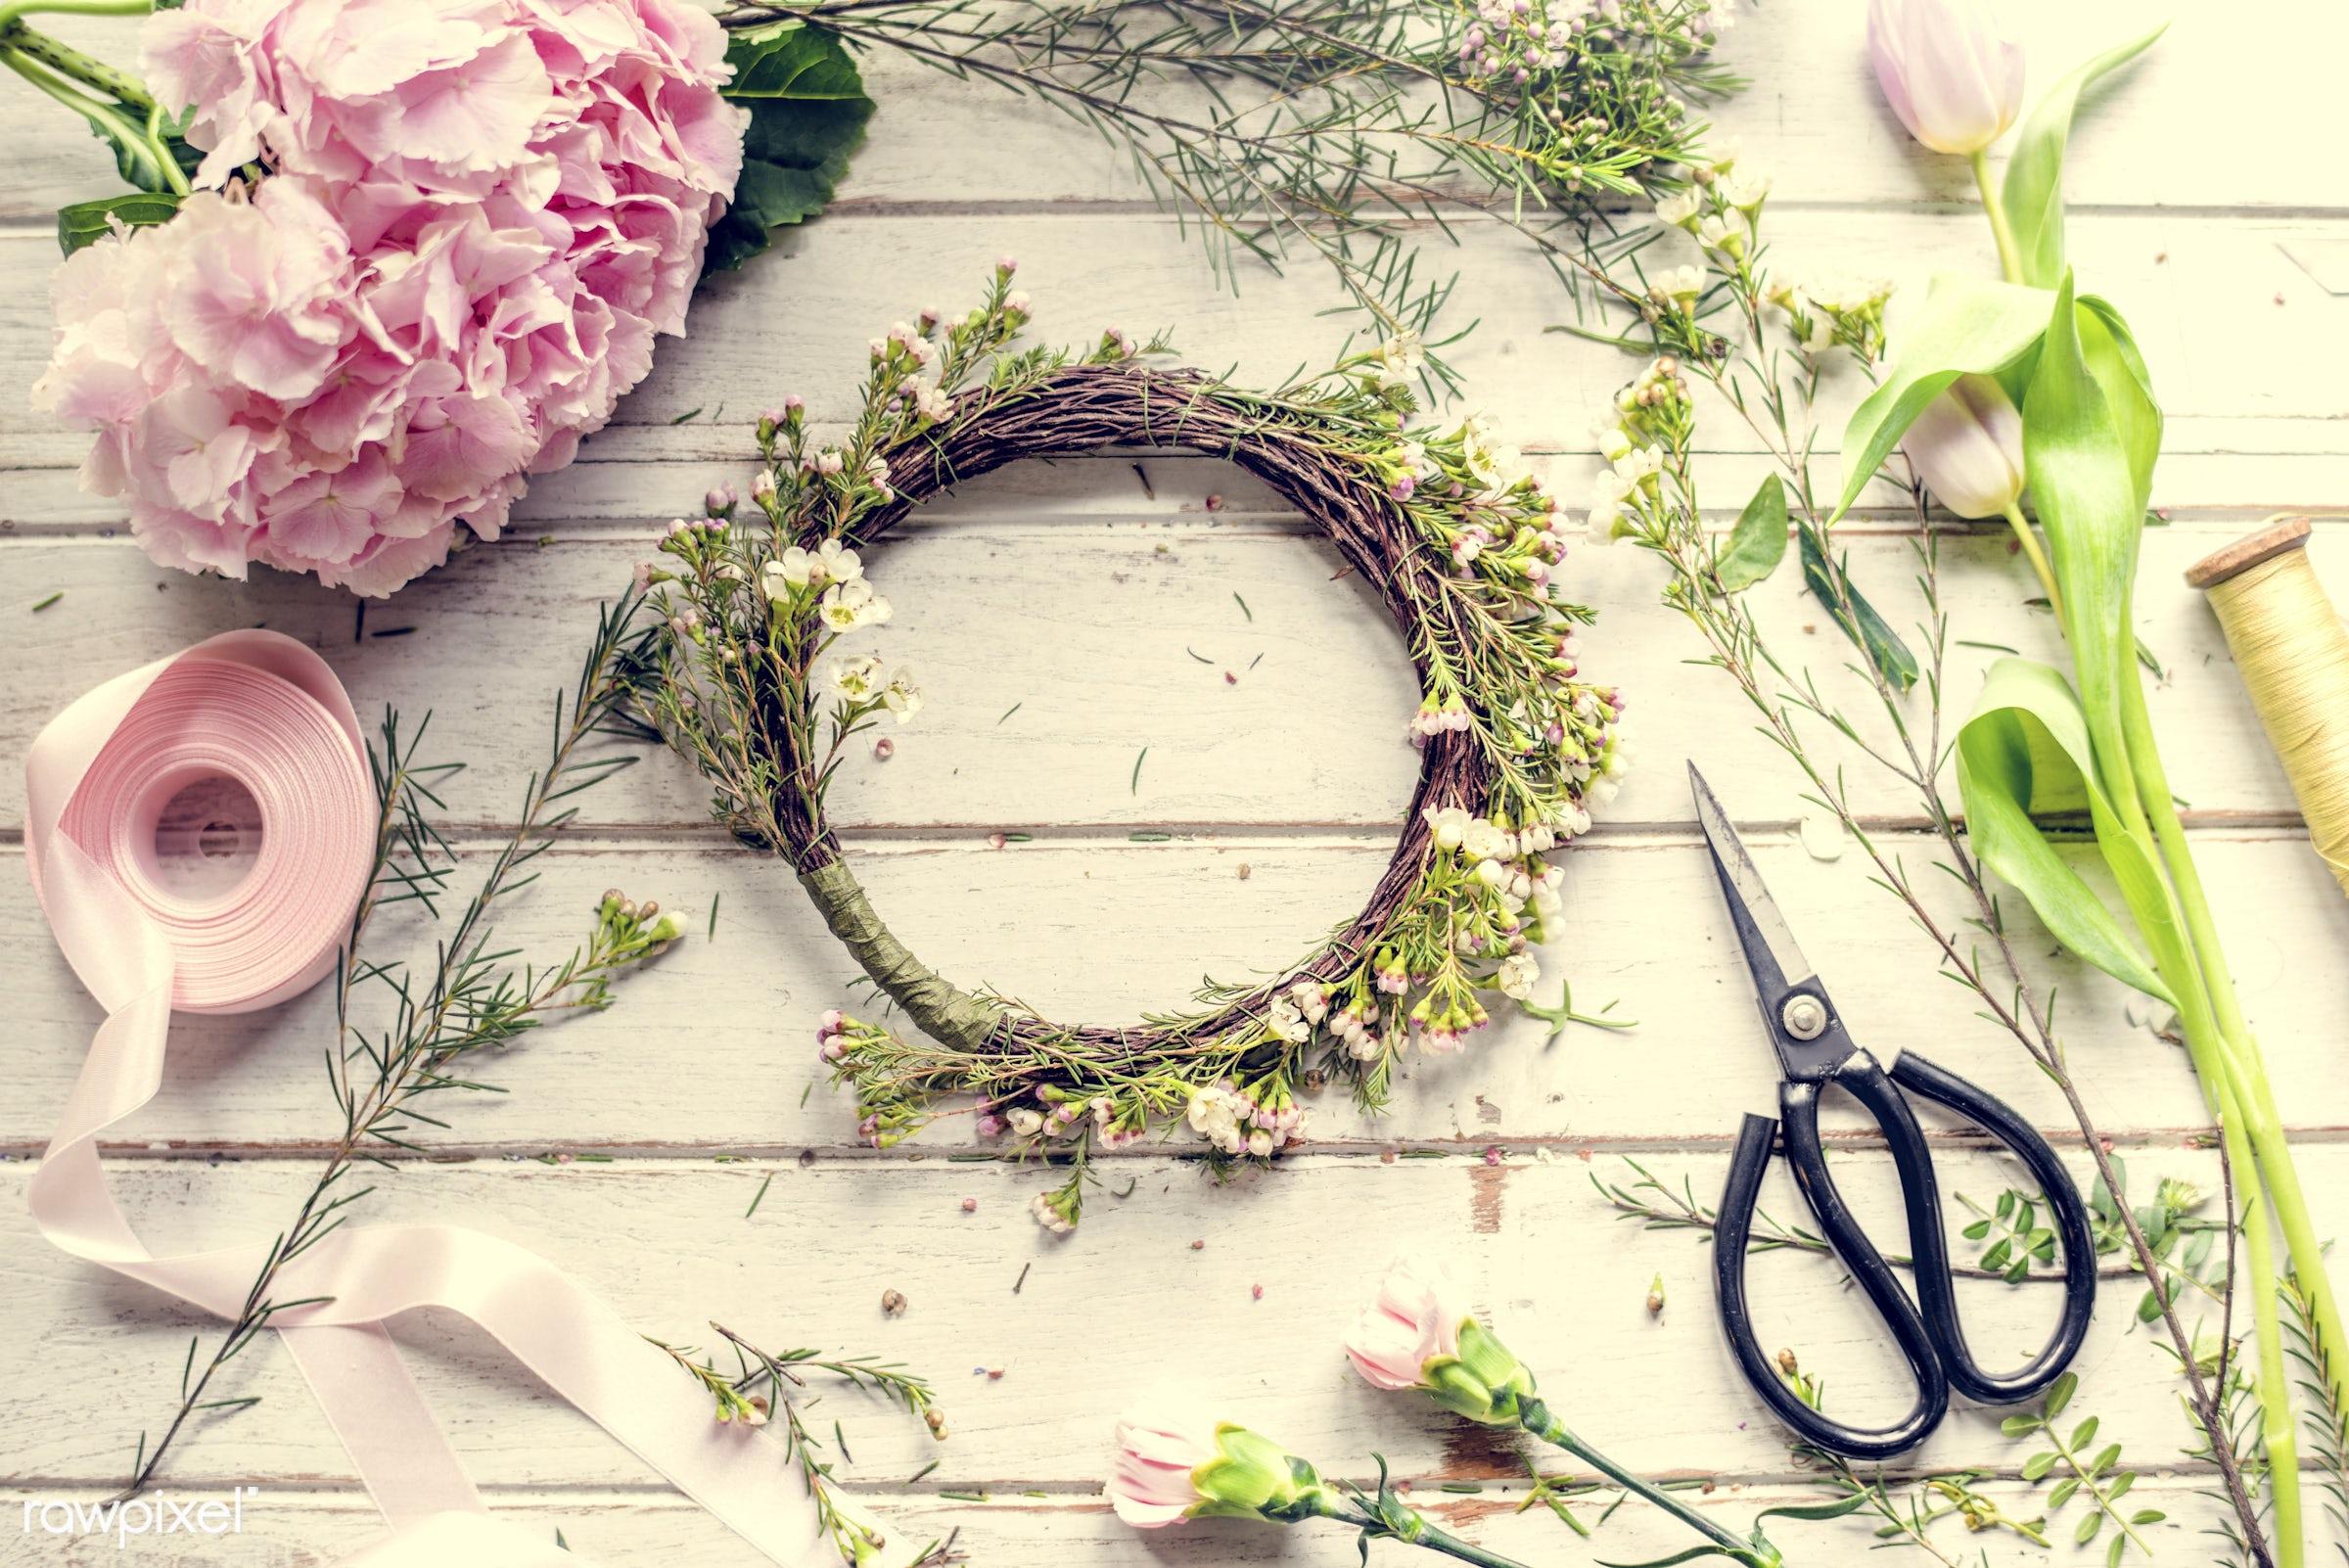 shop, festive, detail, decorative, colorful, events, plants, spring, blossom, wax flower, decor, nature, fresh, attractive,...